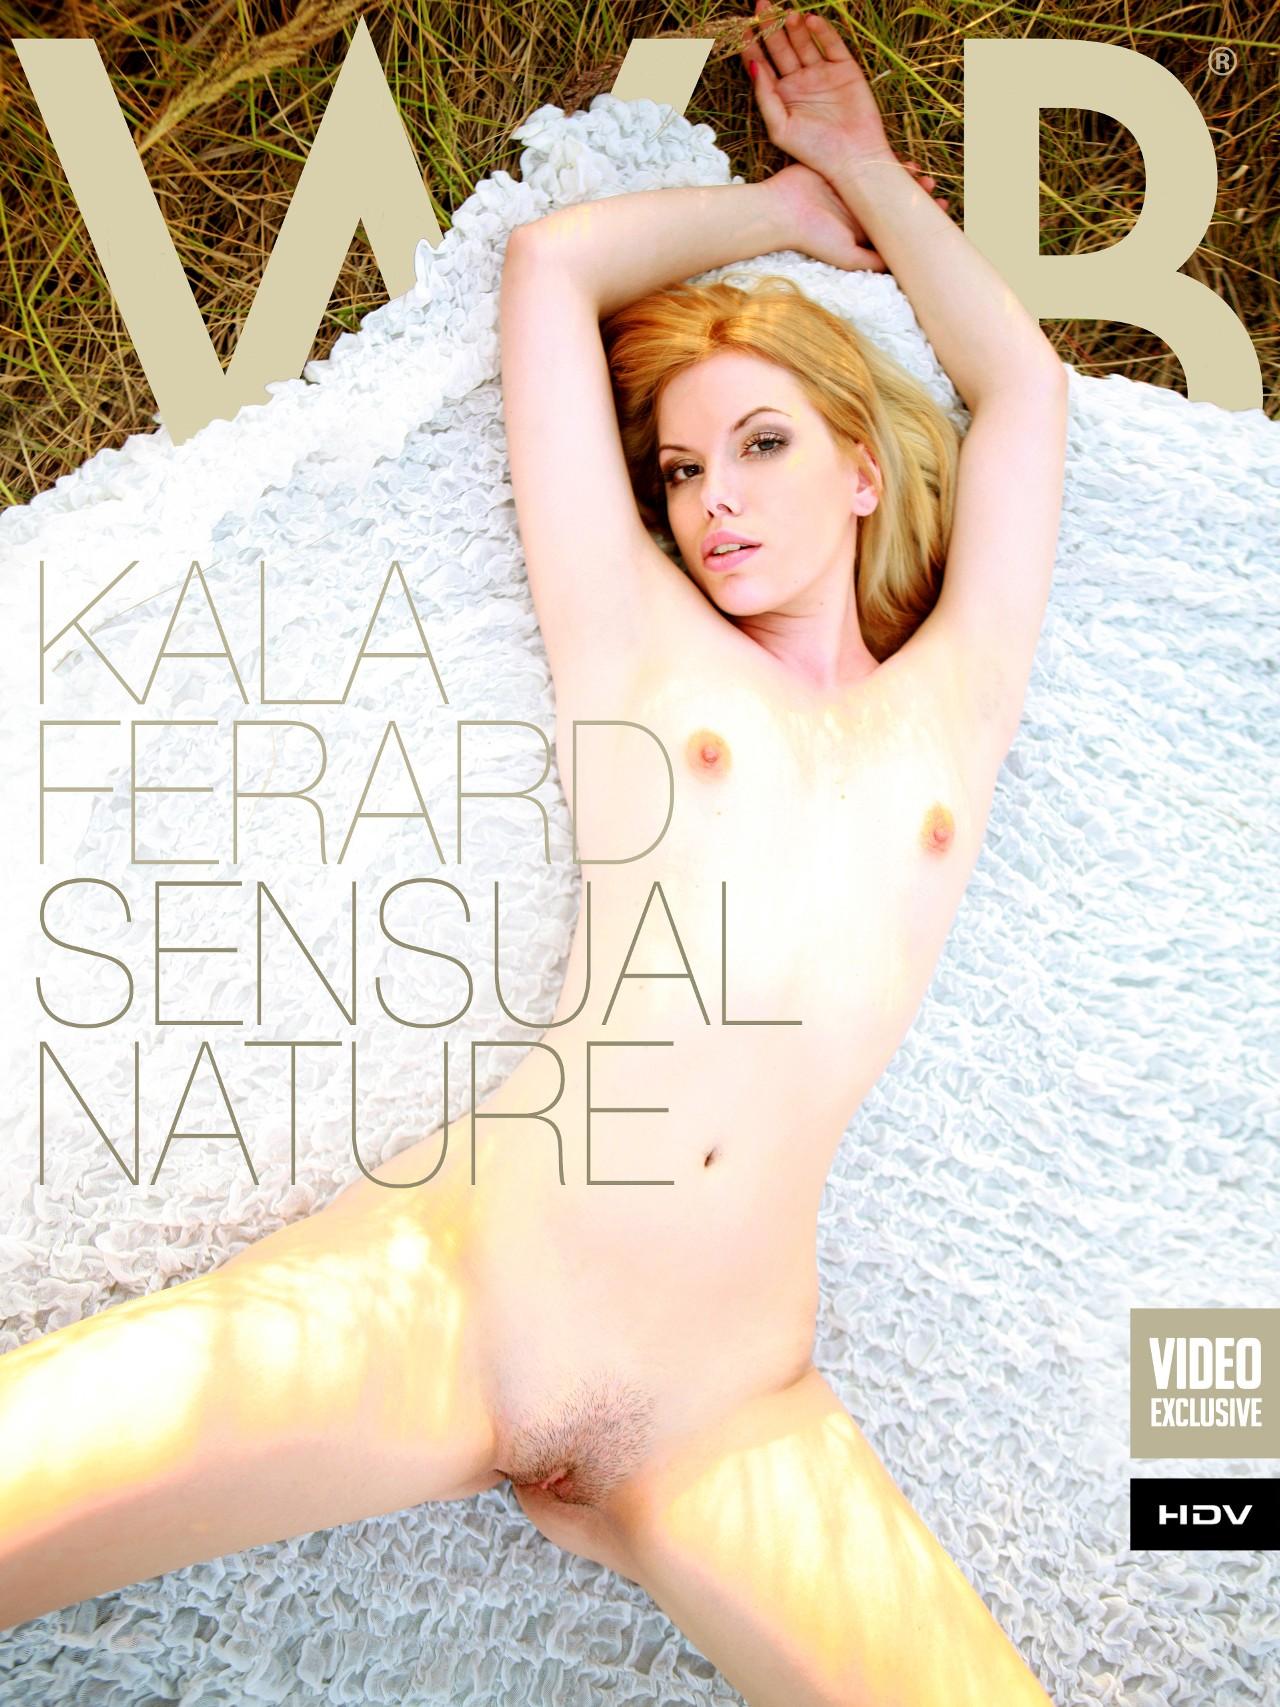 Kala Ferard: Sensual nature